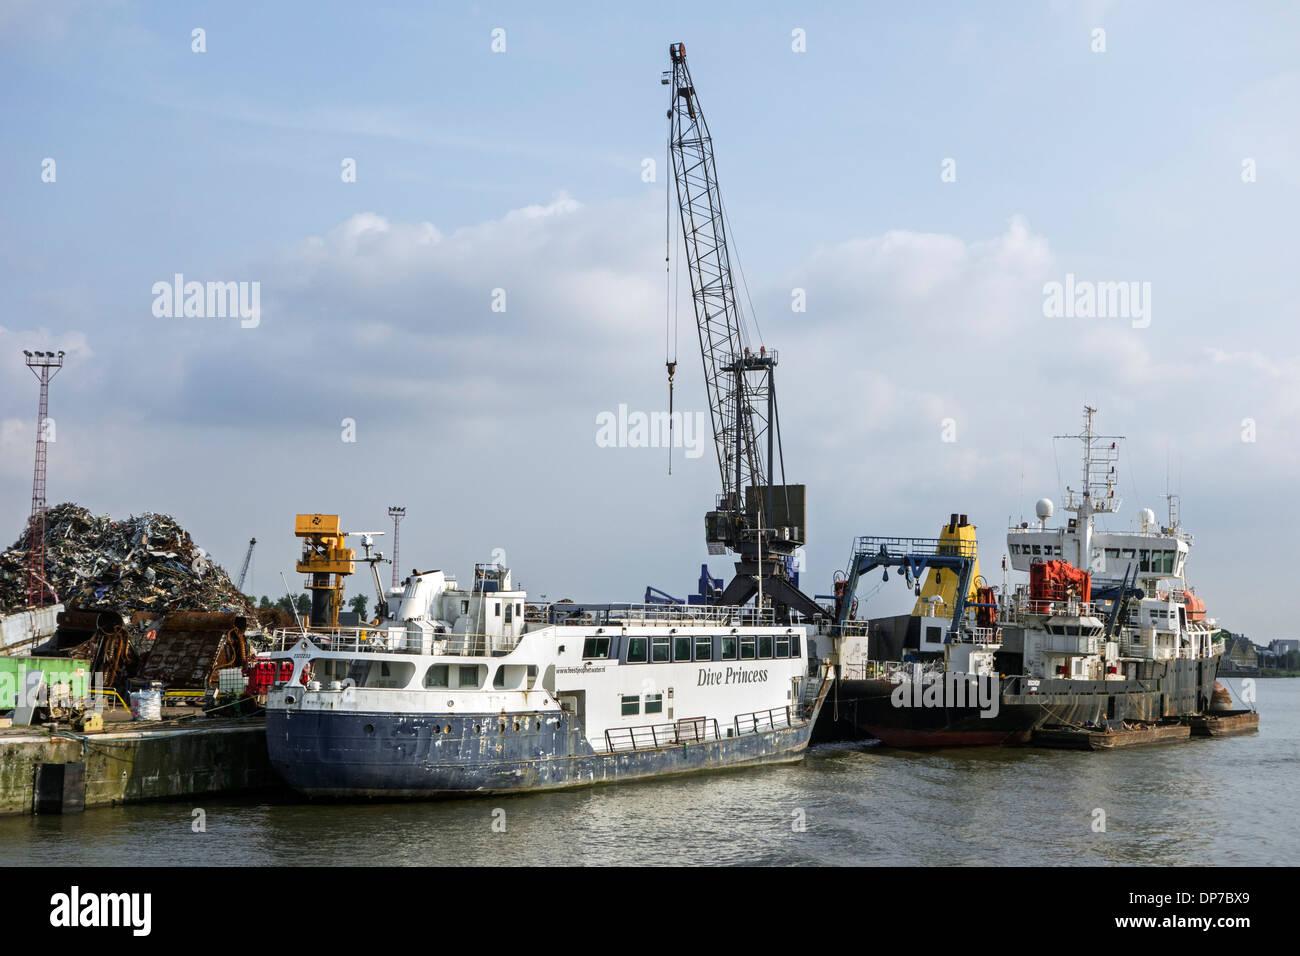 Old ship being dismantled to recycle scrap metal at Van Heyghen Recycling export terminal, port of Ghent, East Flanders, Belgium - Stock Image